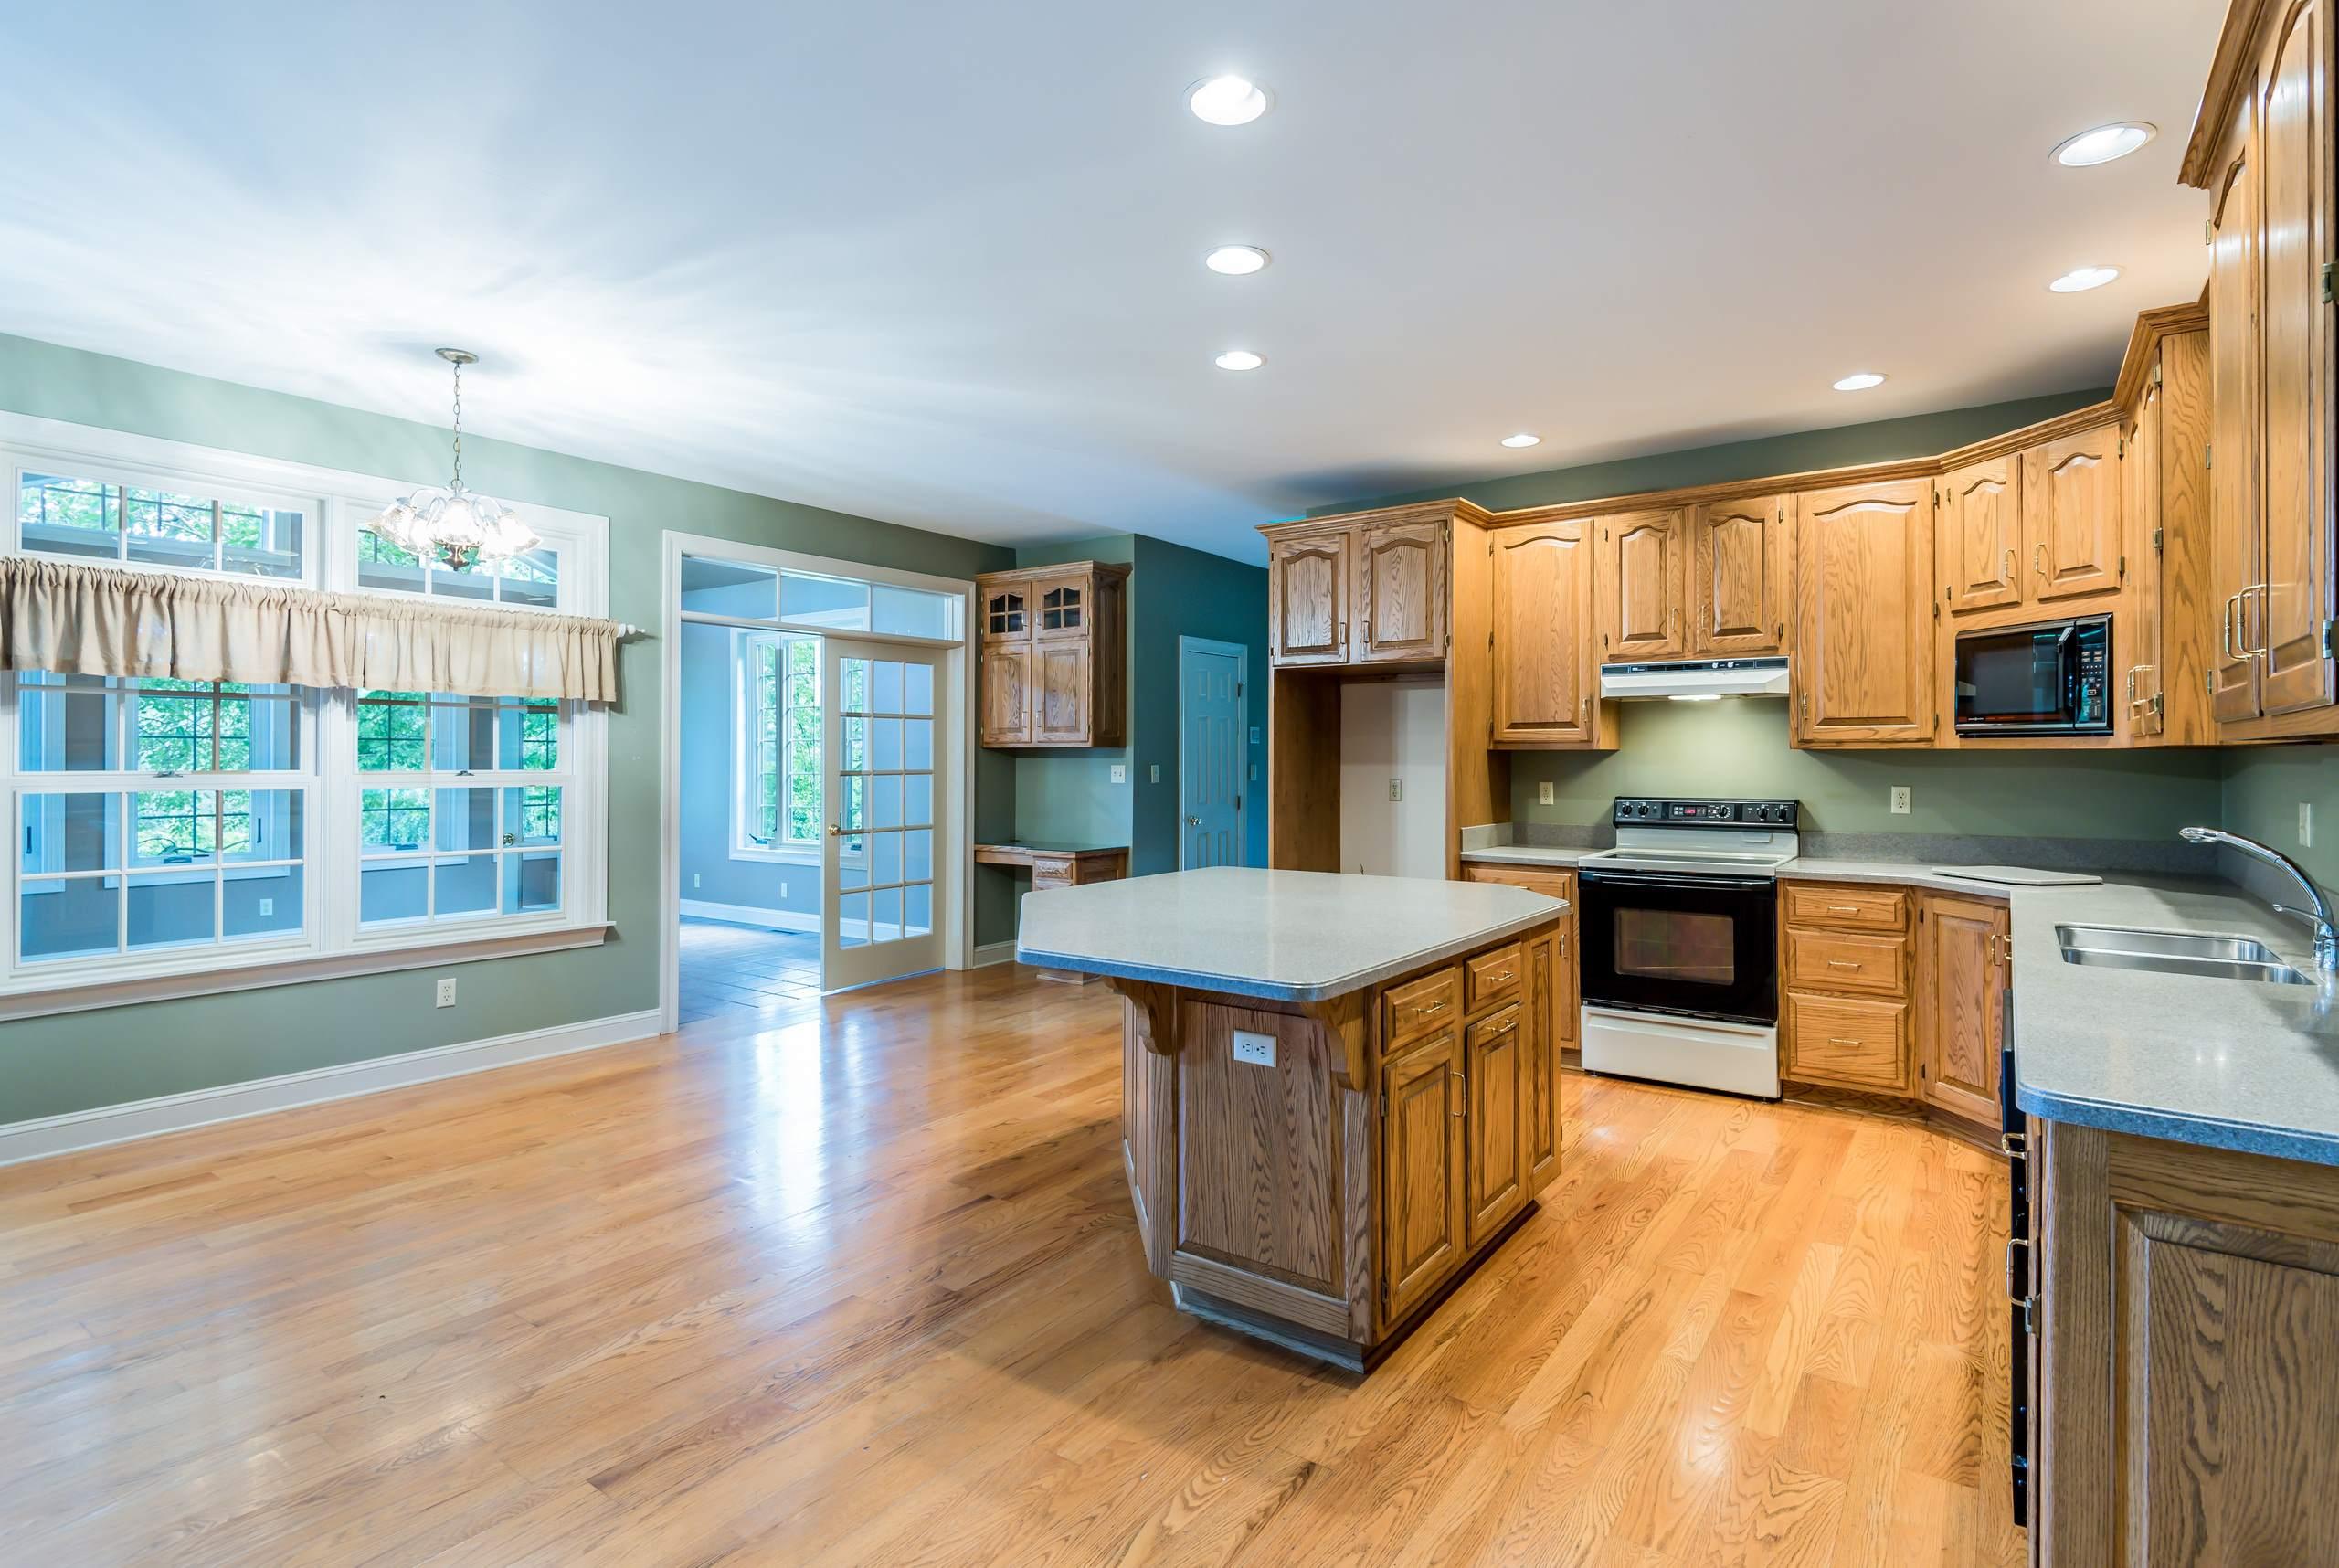 105 Balfour Dr, Mechanicsburg, PA 17050 | RealEstate.com